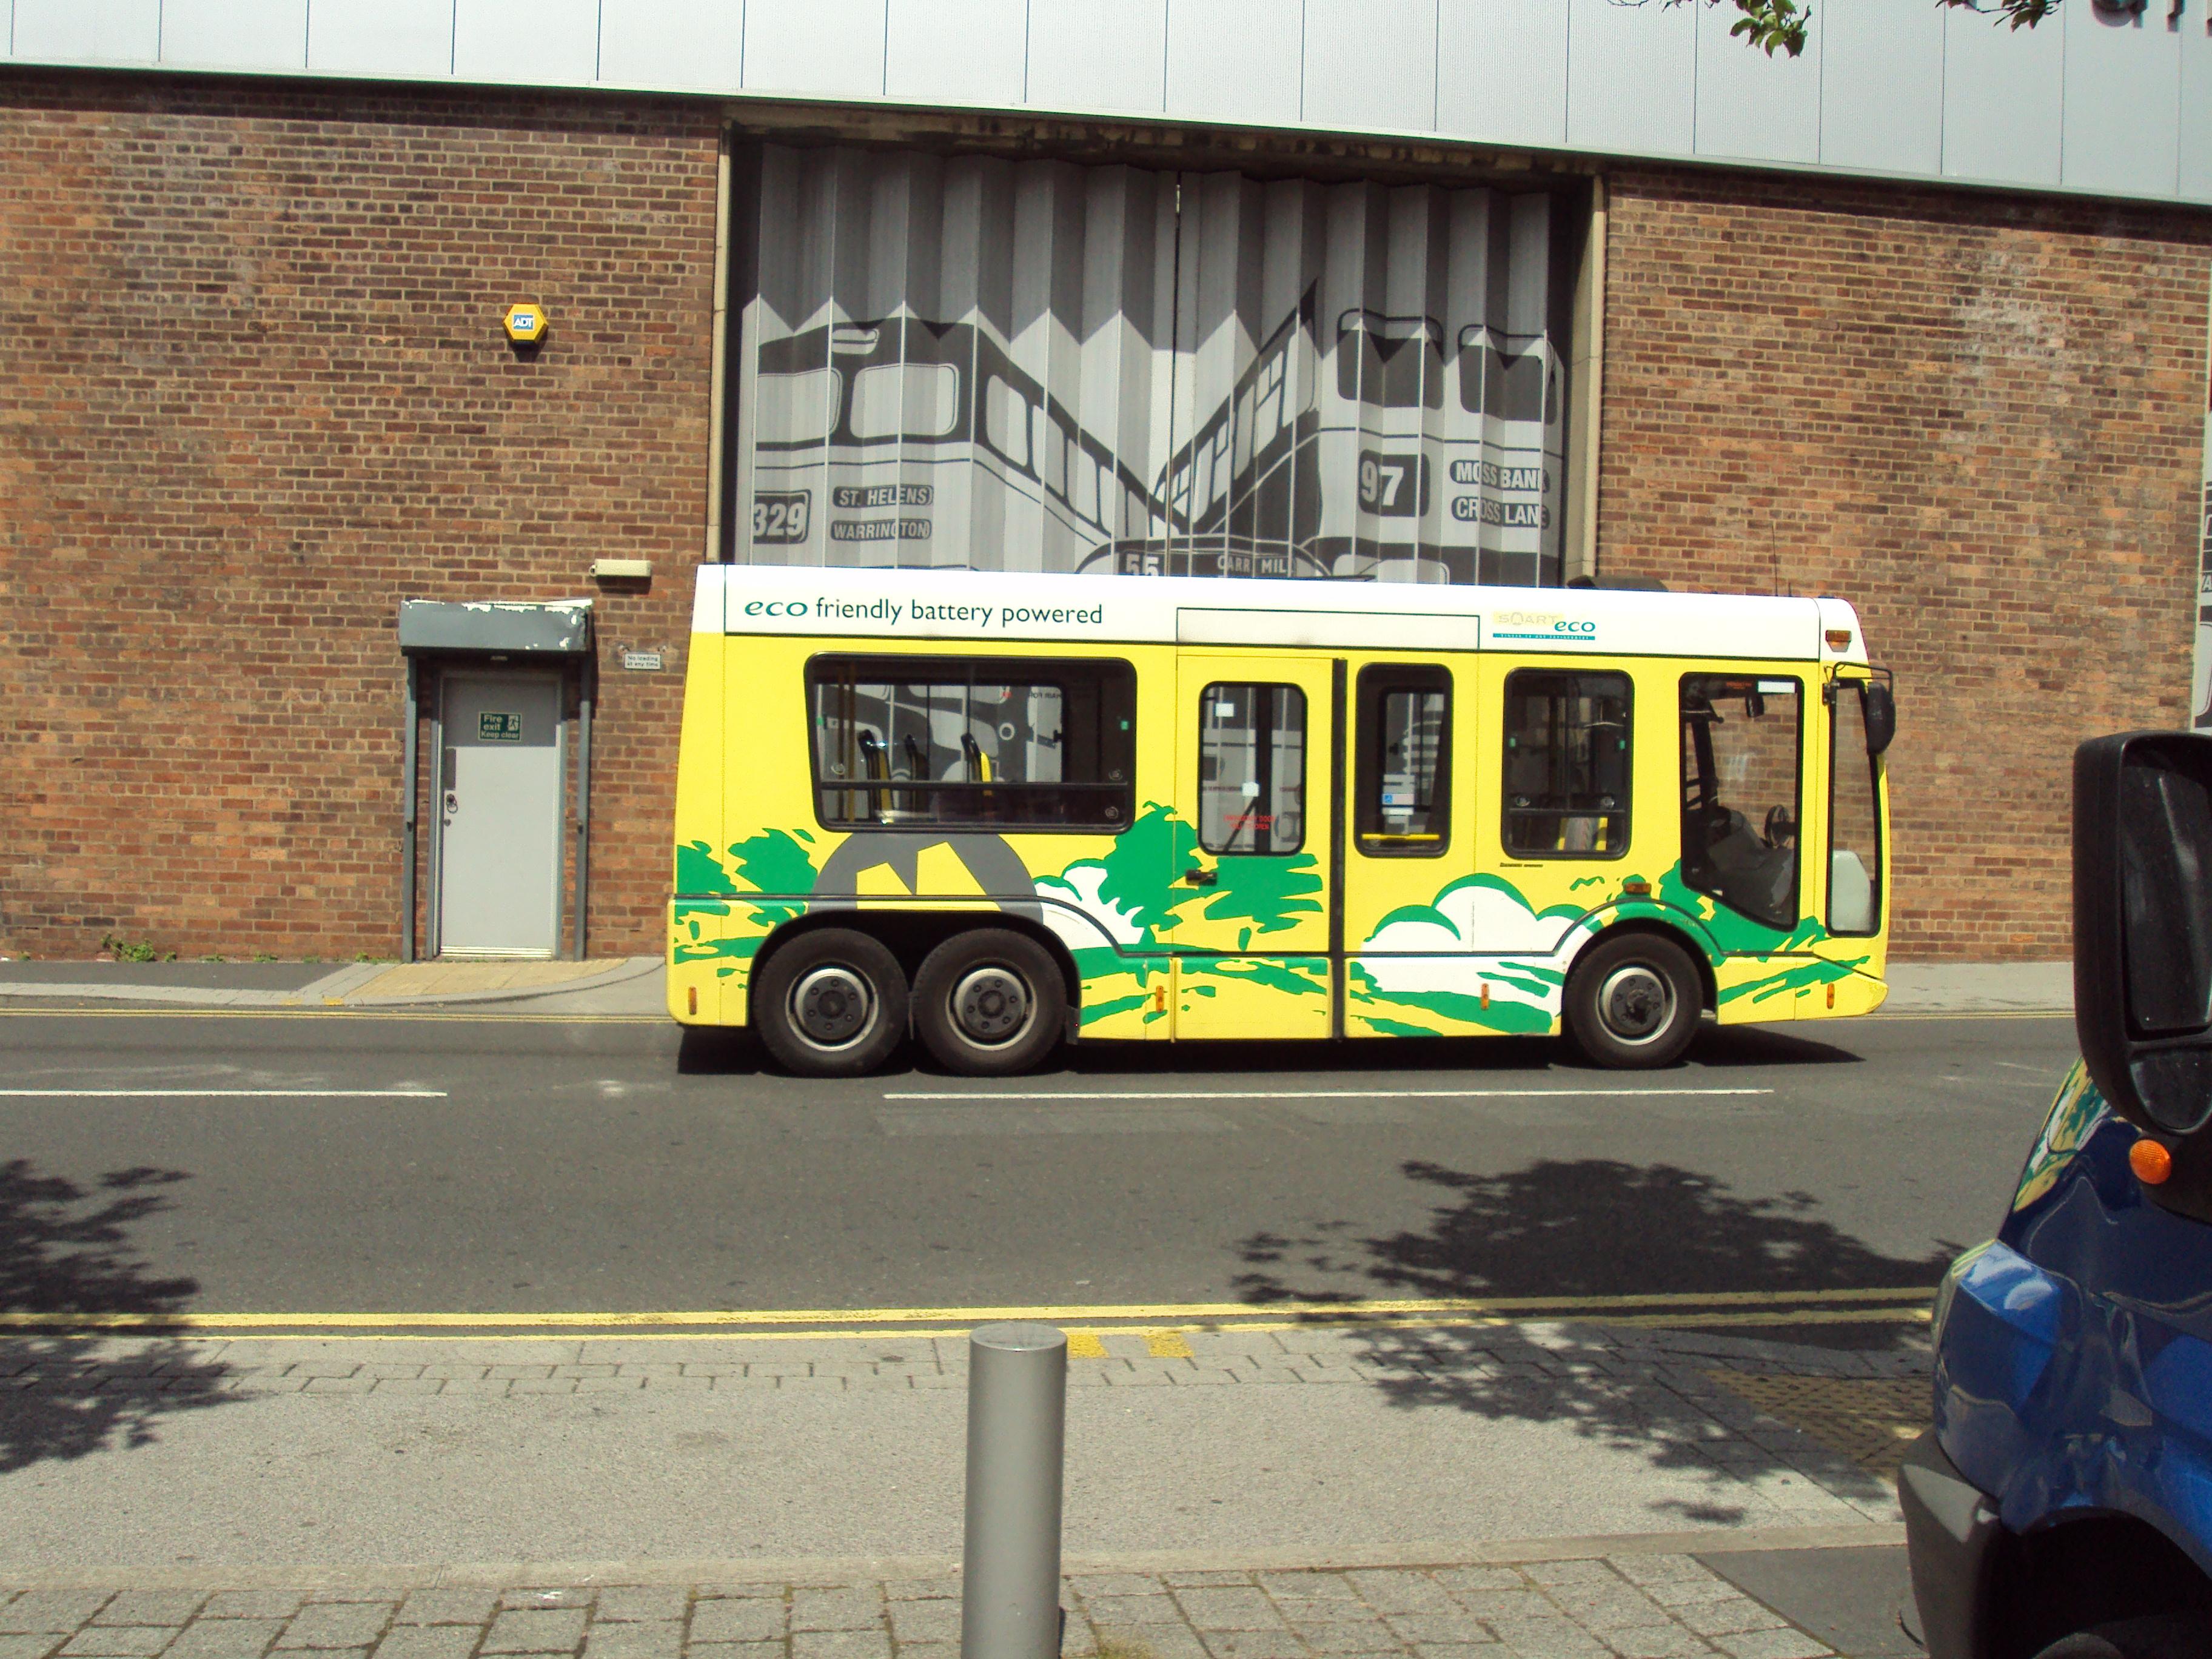 file:eco-bus, st helens - dsc00147 - wikimedia commons